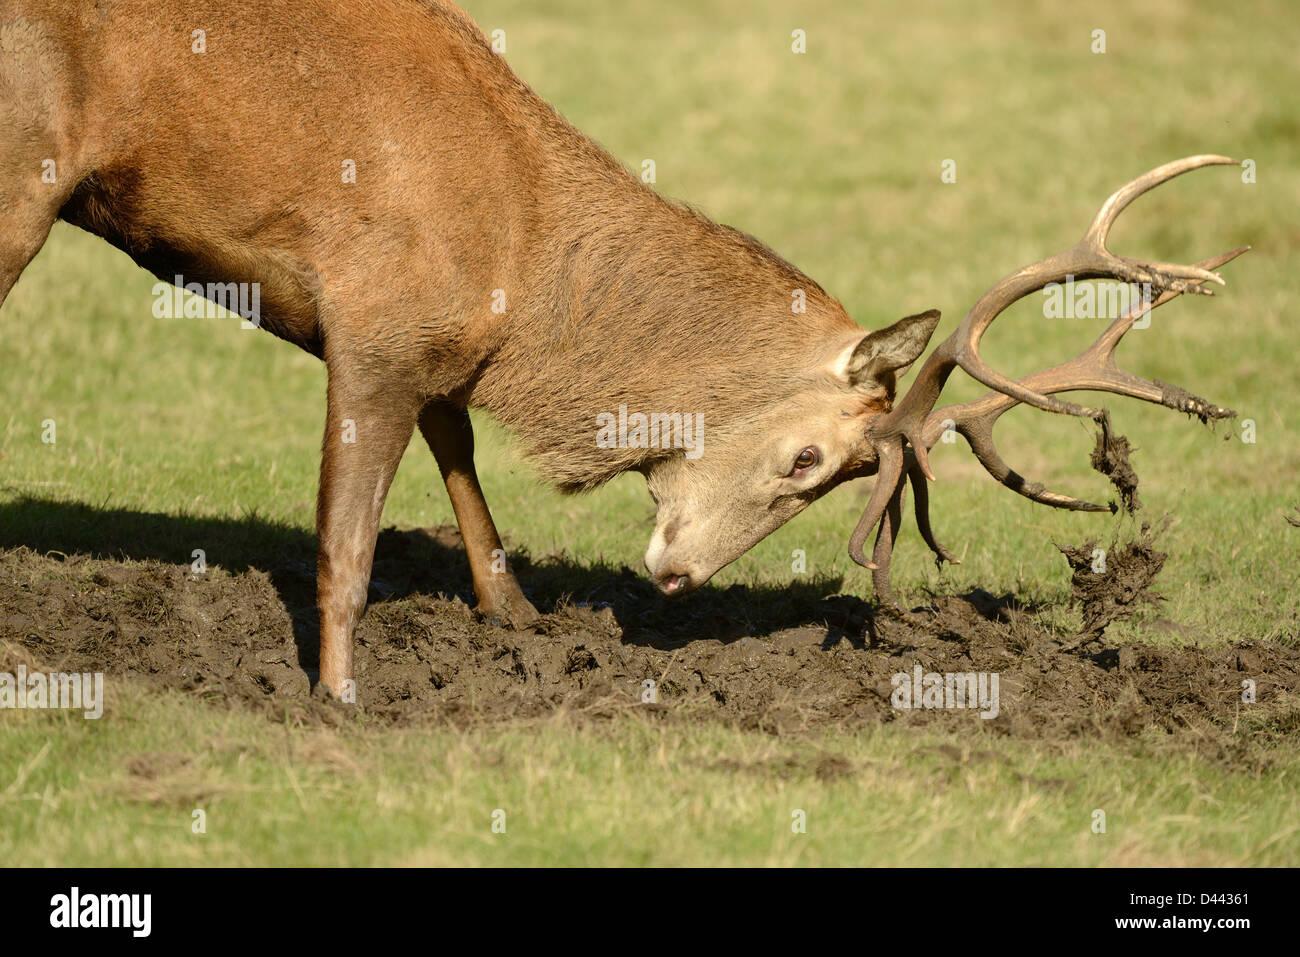 Red Deer (Cervus elaphus) stag covering antlers in mud during the rut, Richmond Park, October - Stock Image